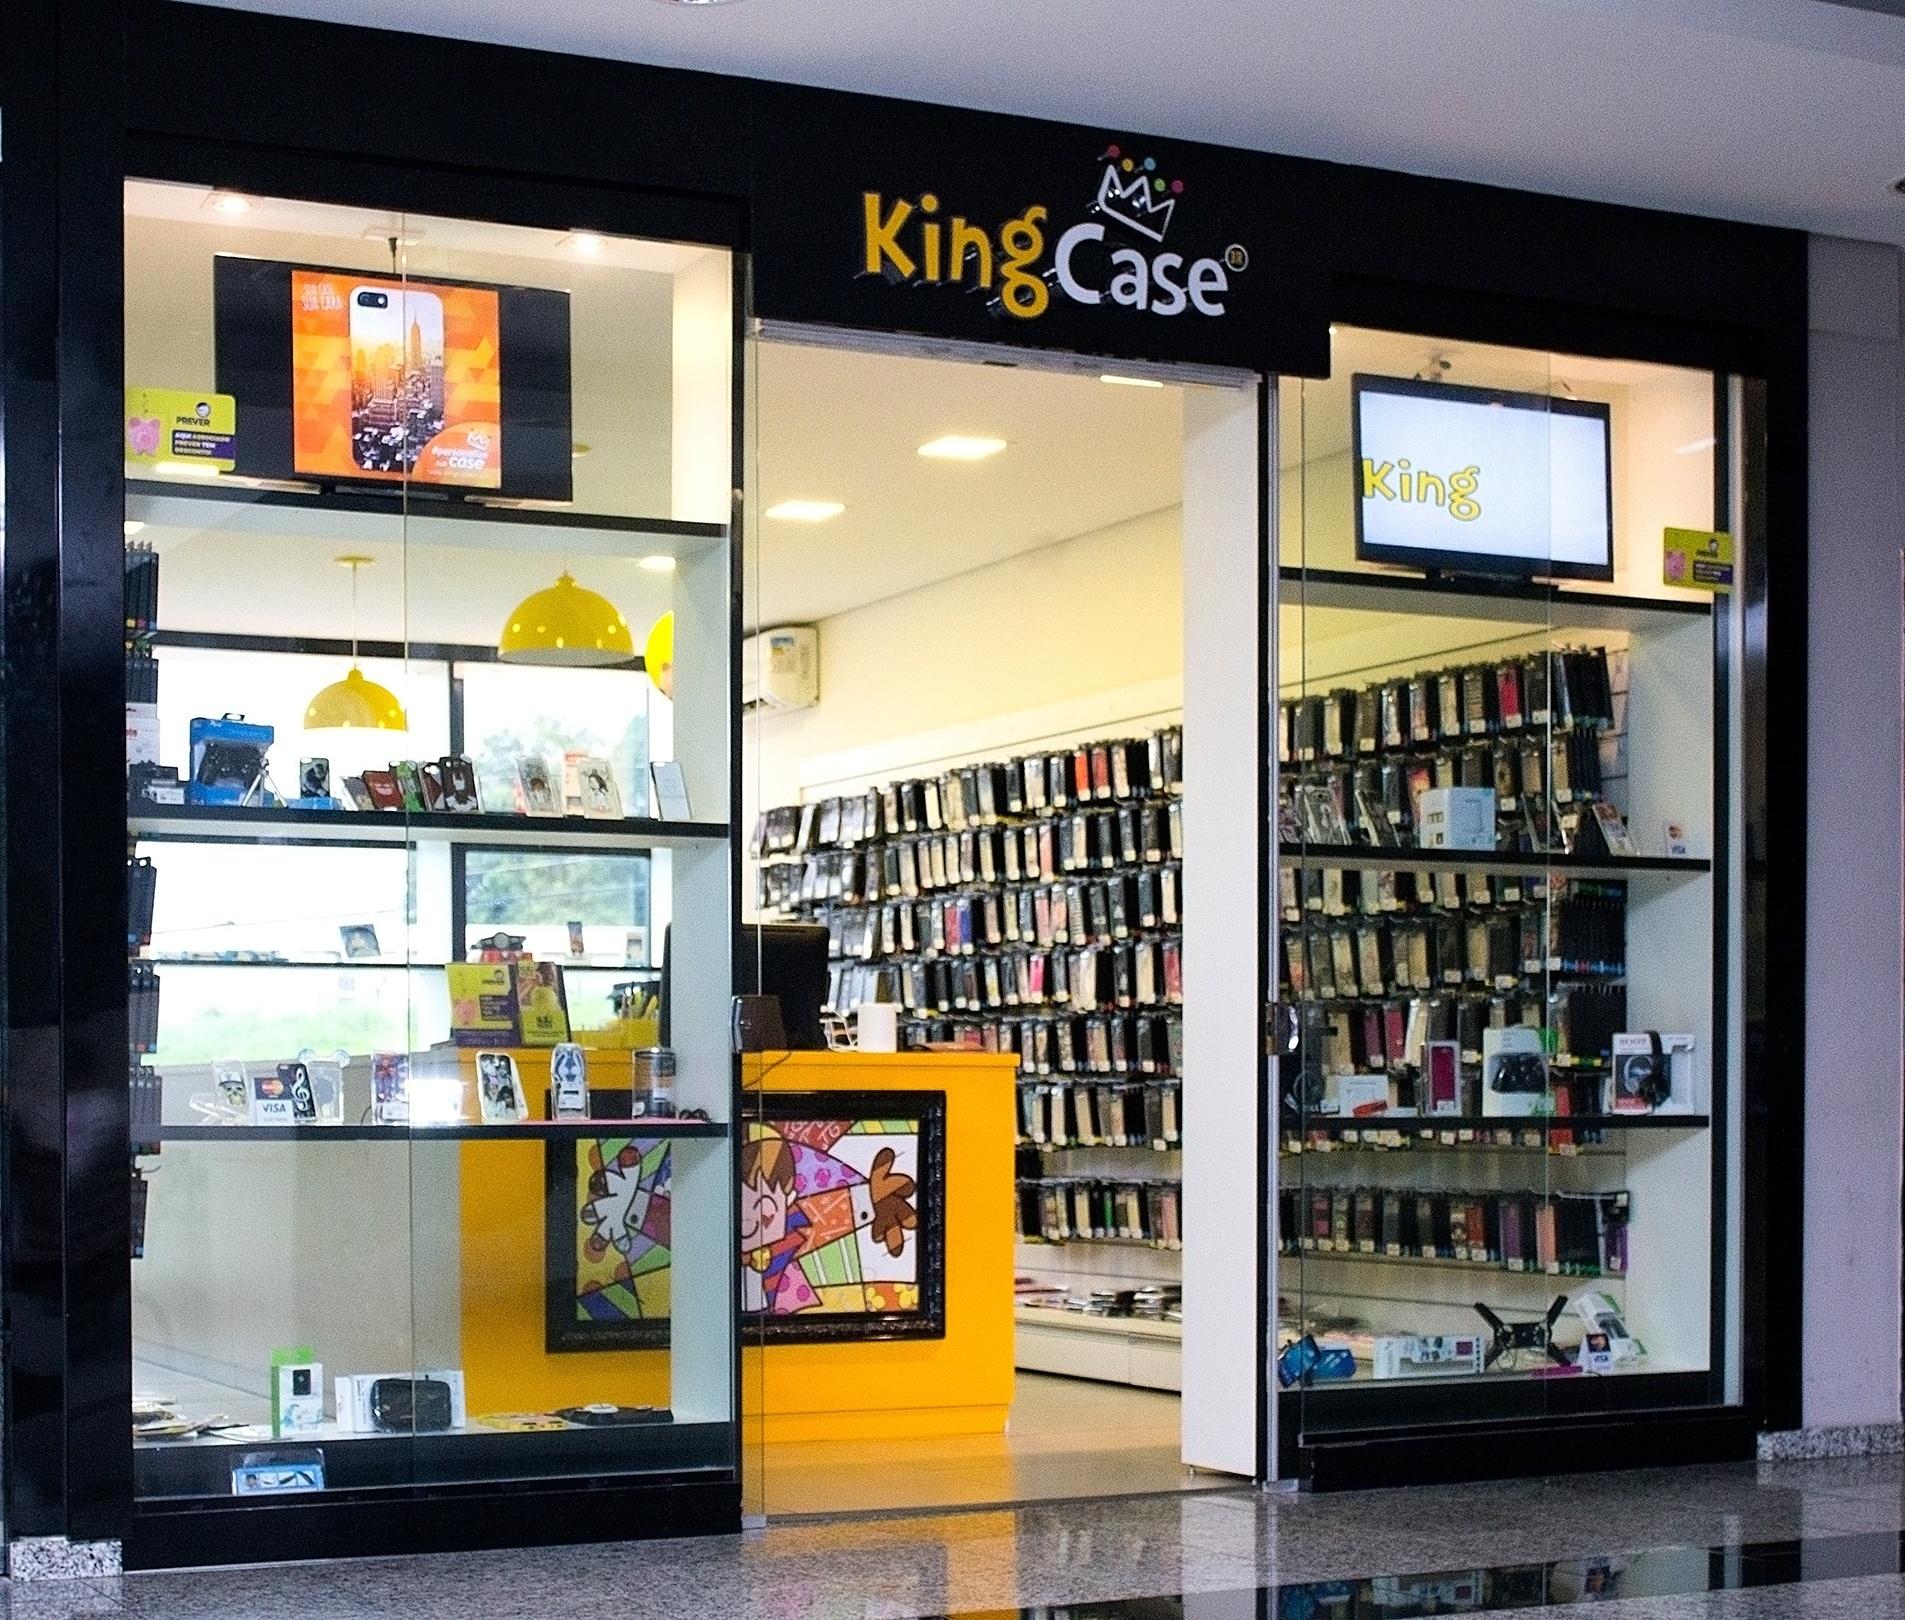 KingCase